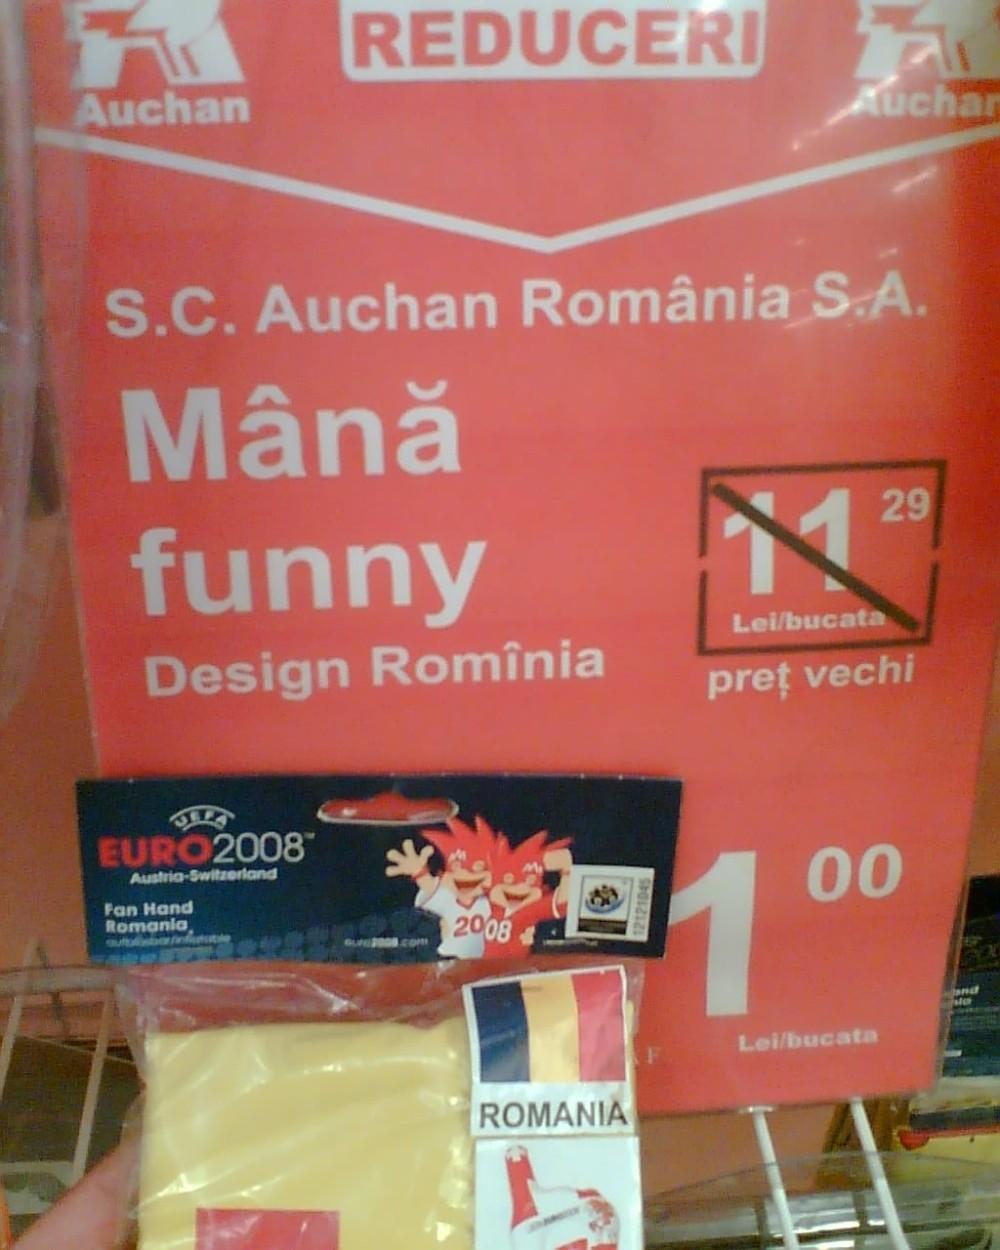 Mana funny Auchan